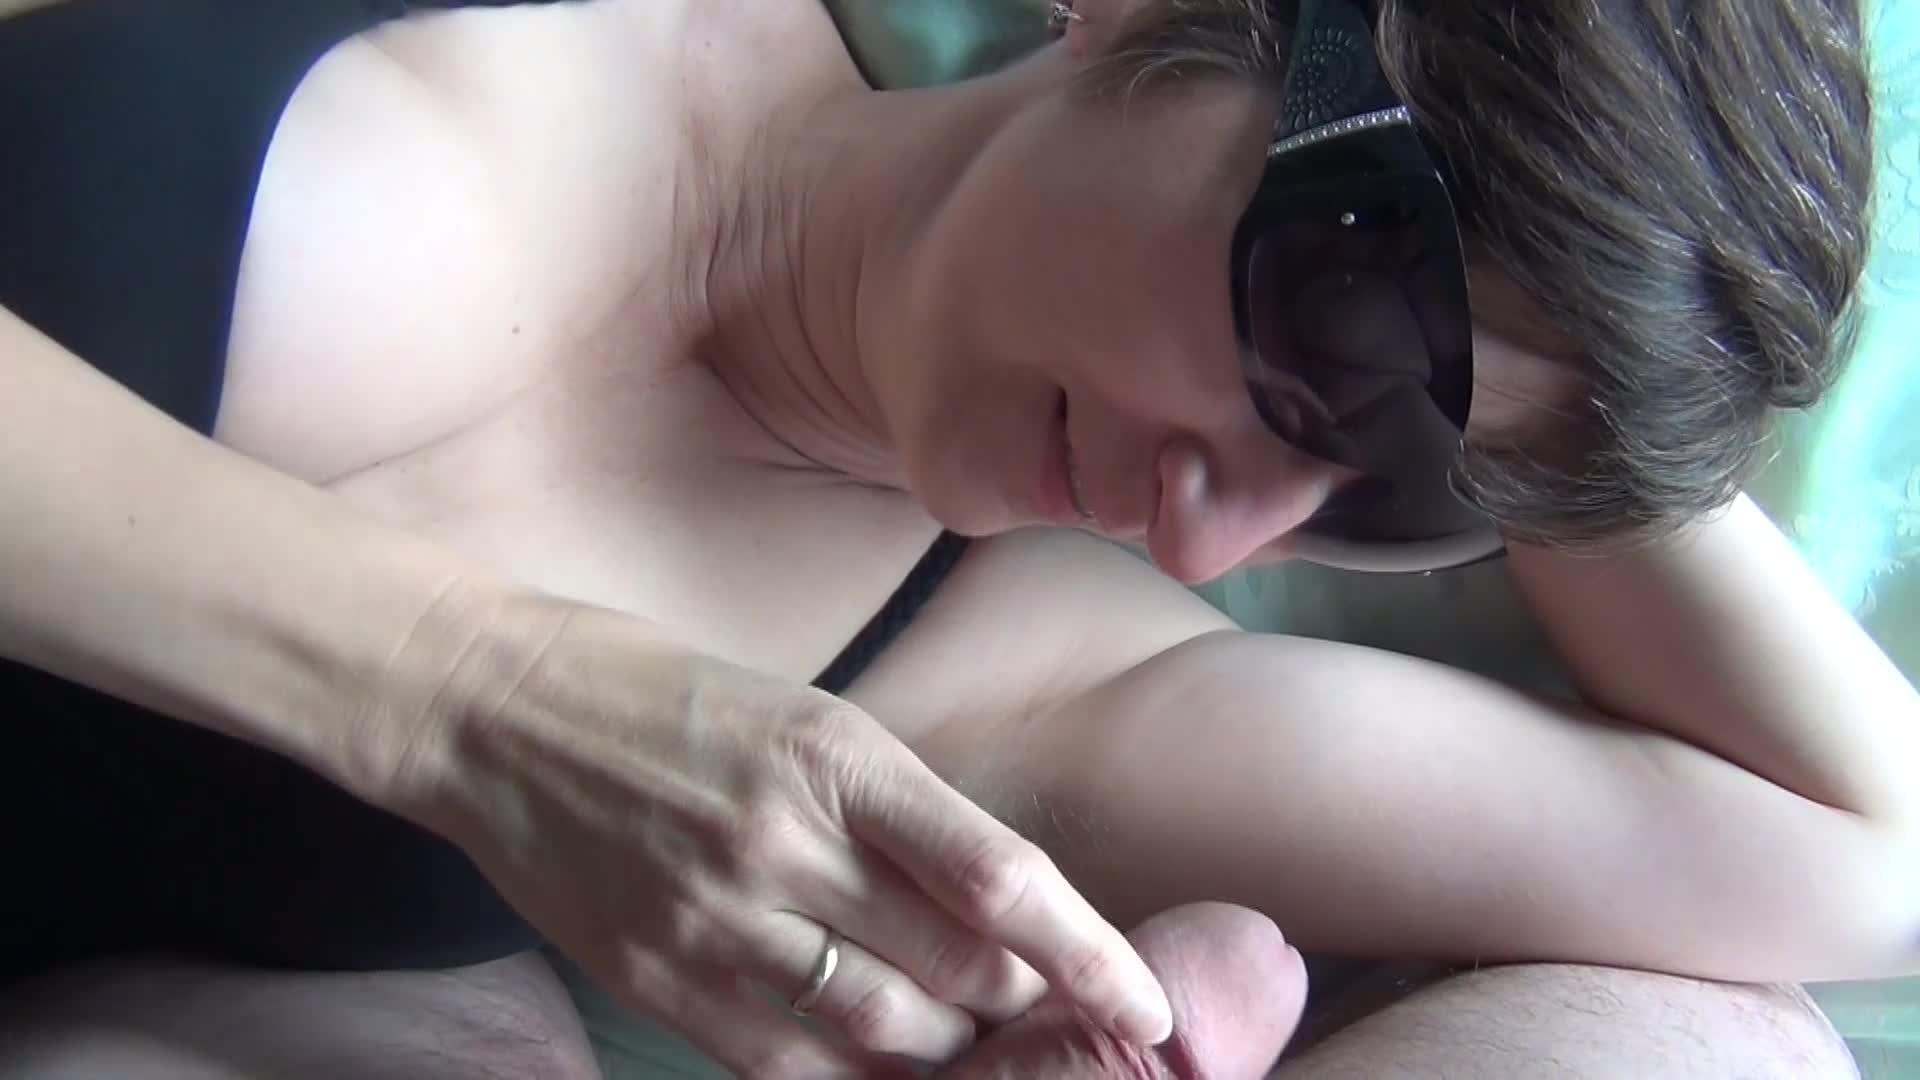 Pinkts finger masturbation labia alone gif